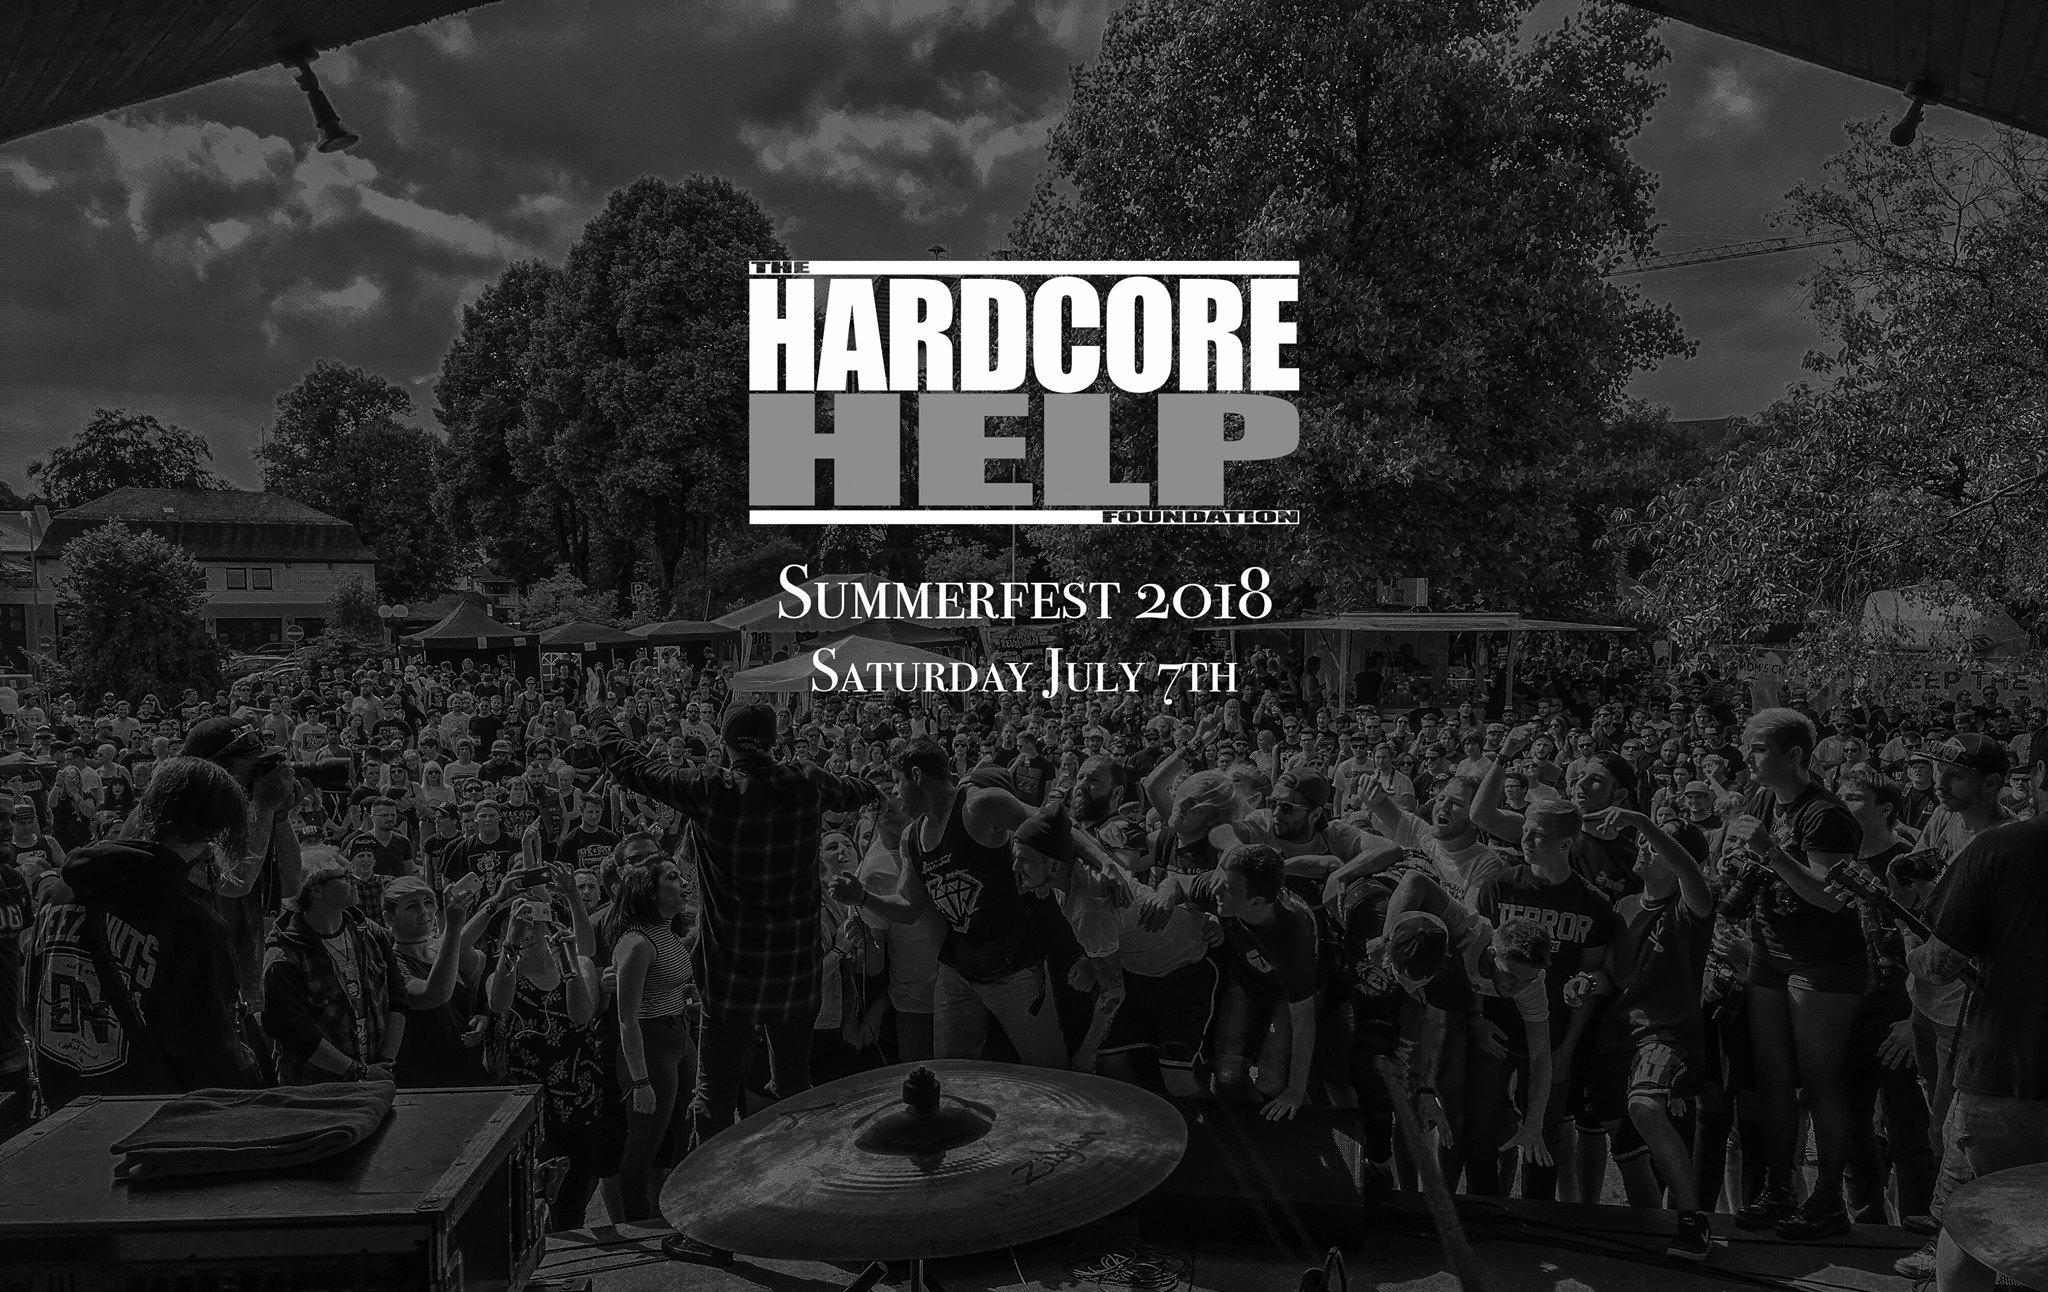 HardcorHelpFoundation - 2018